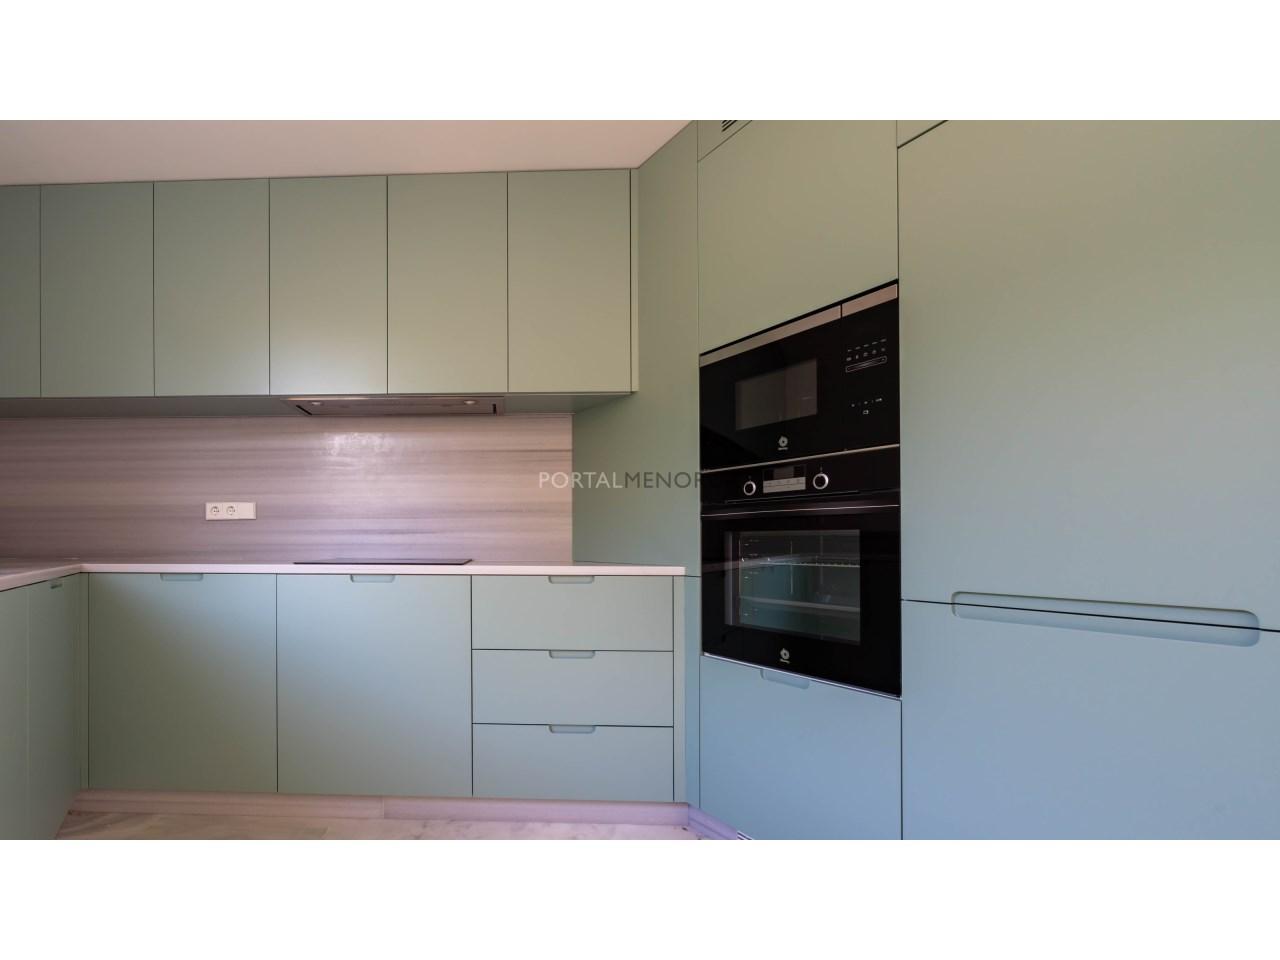 buy-villa-luxury-coves-noves-menorca (2)